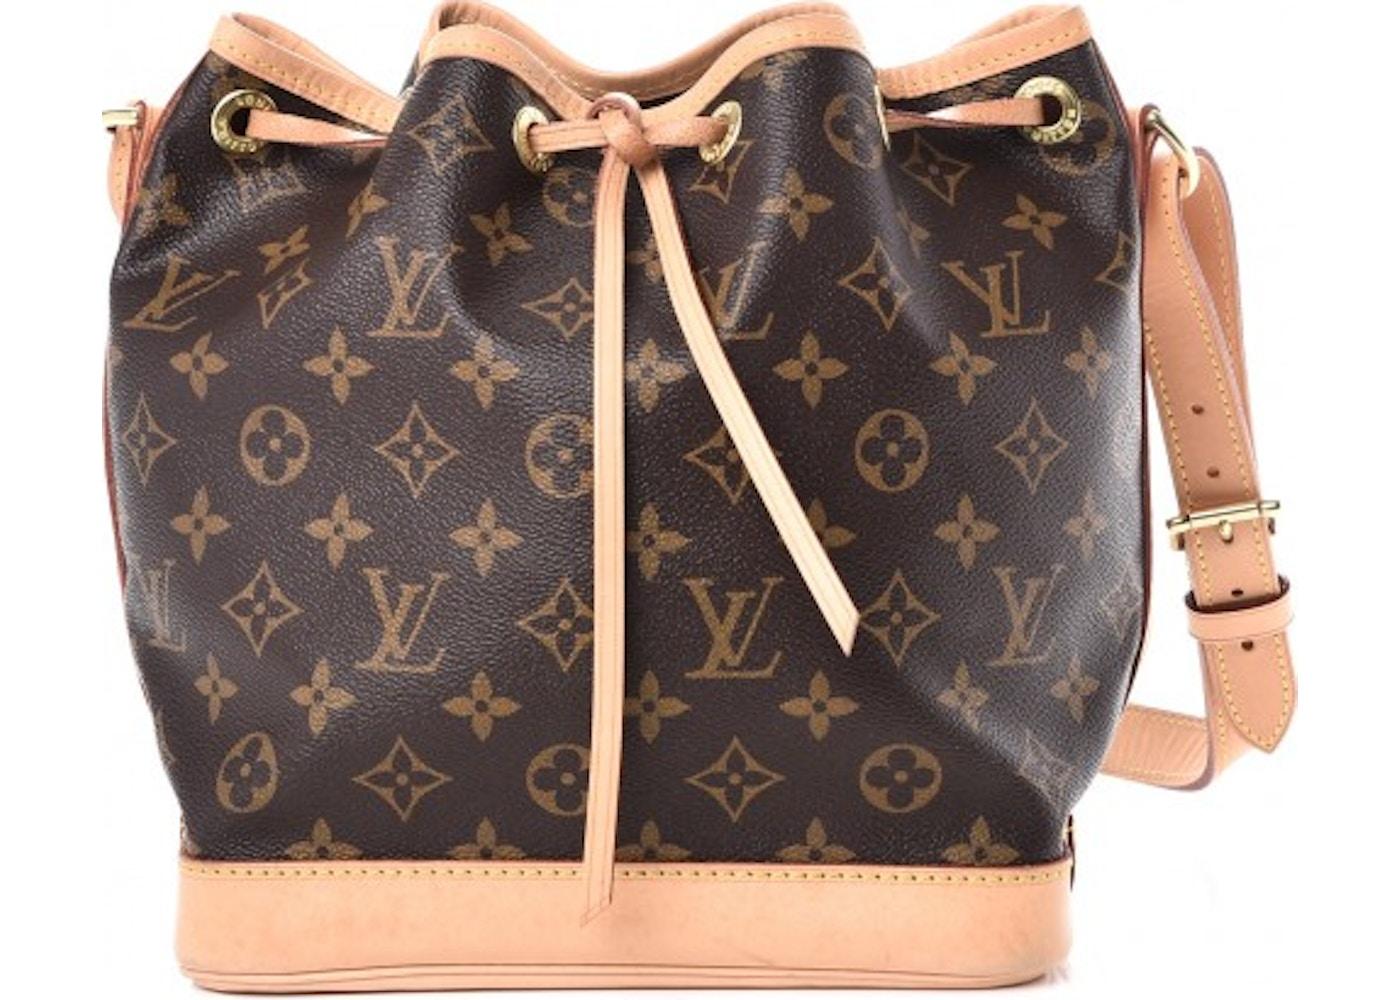 fc1f3e274cd2 Louis Vuitton Monogram Canvas Petit Bucket Bag Price ✓ Labzada ...